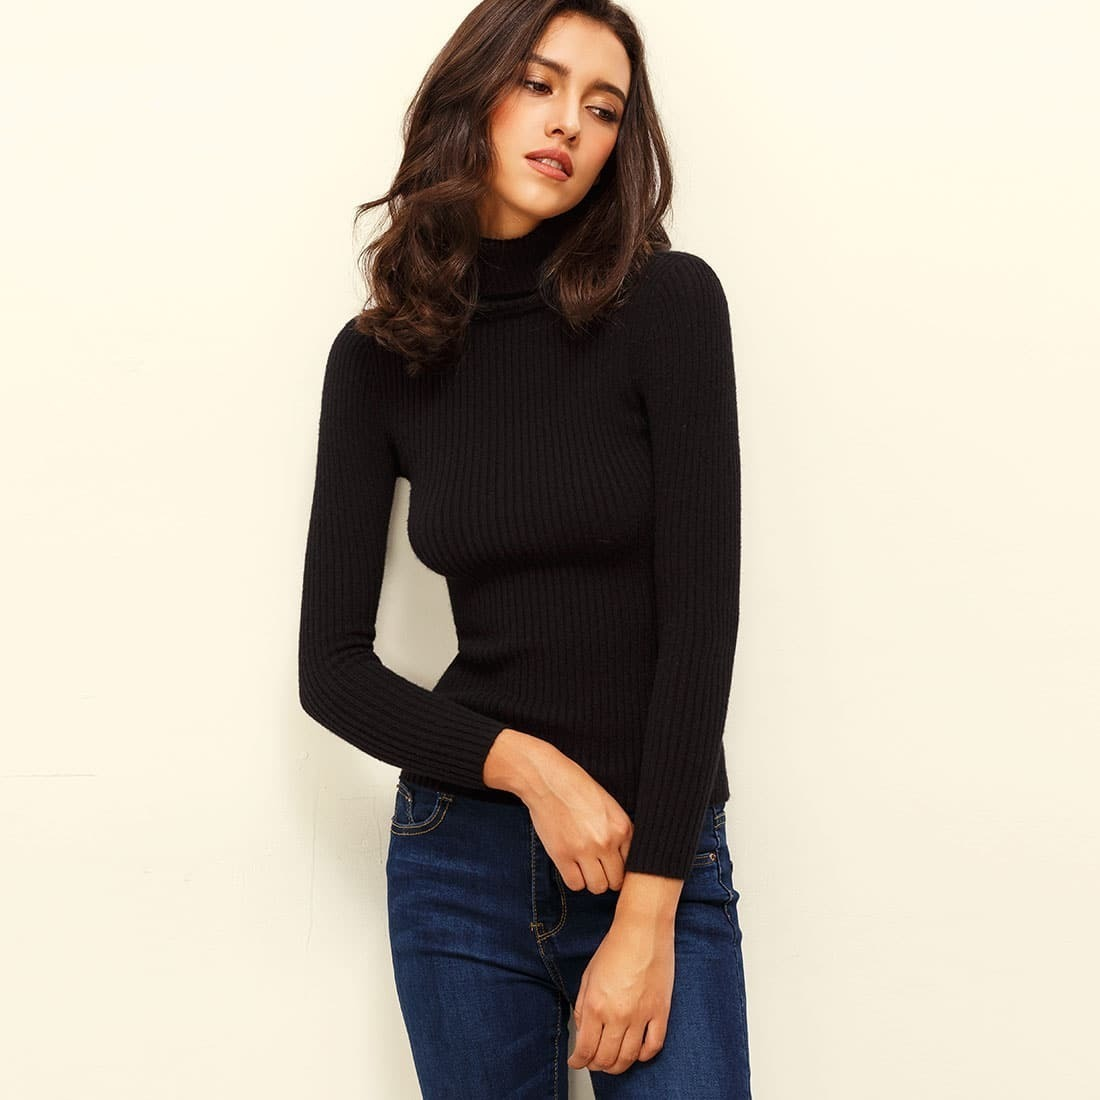 - Black Turtle Neck Long Sleeve Knitted Tshirt